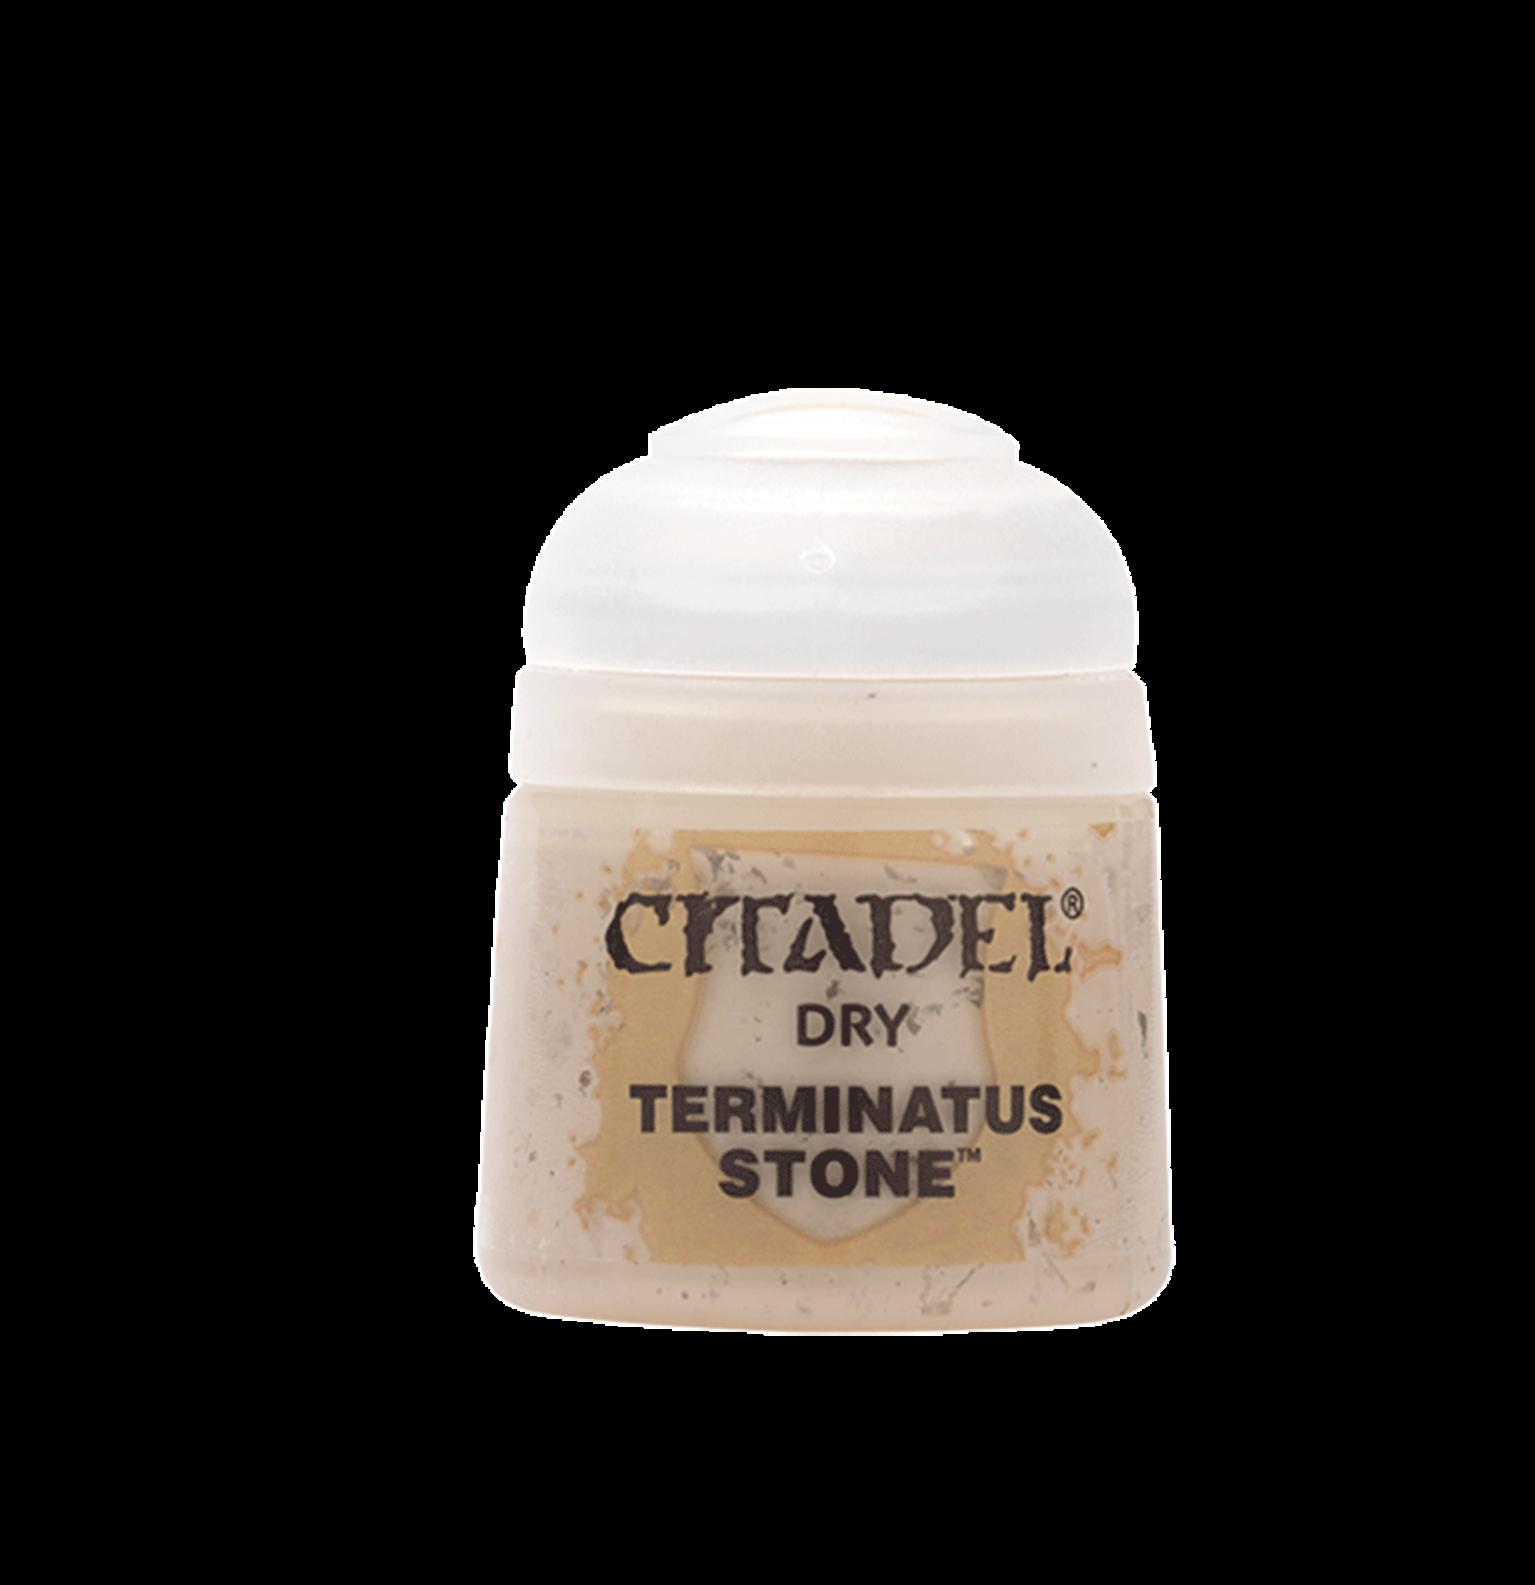 CITADEL DRY Terminatus Stone PAINT POT